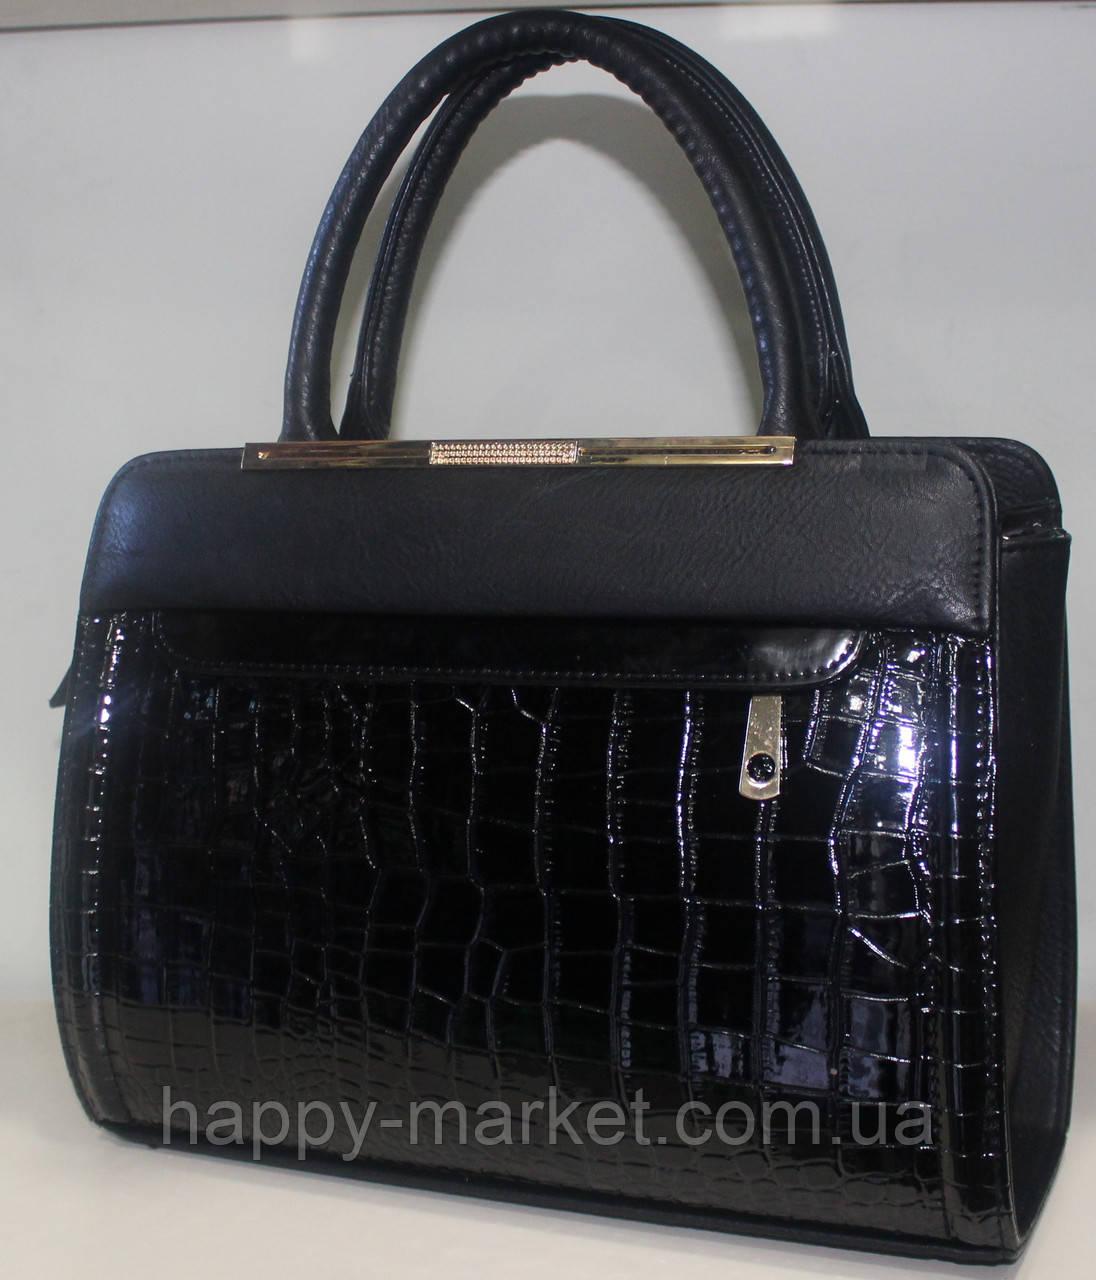 da49aa80a8cc Сумка женская классическая каркасная Victoria Beckham 17-604-3 -  Интернет-магазин Хеппи